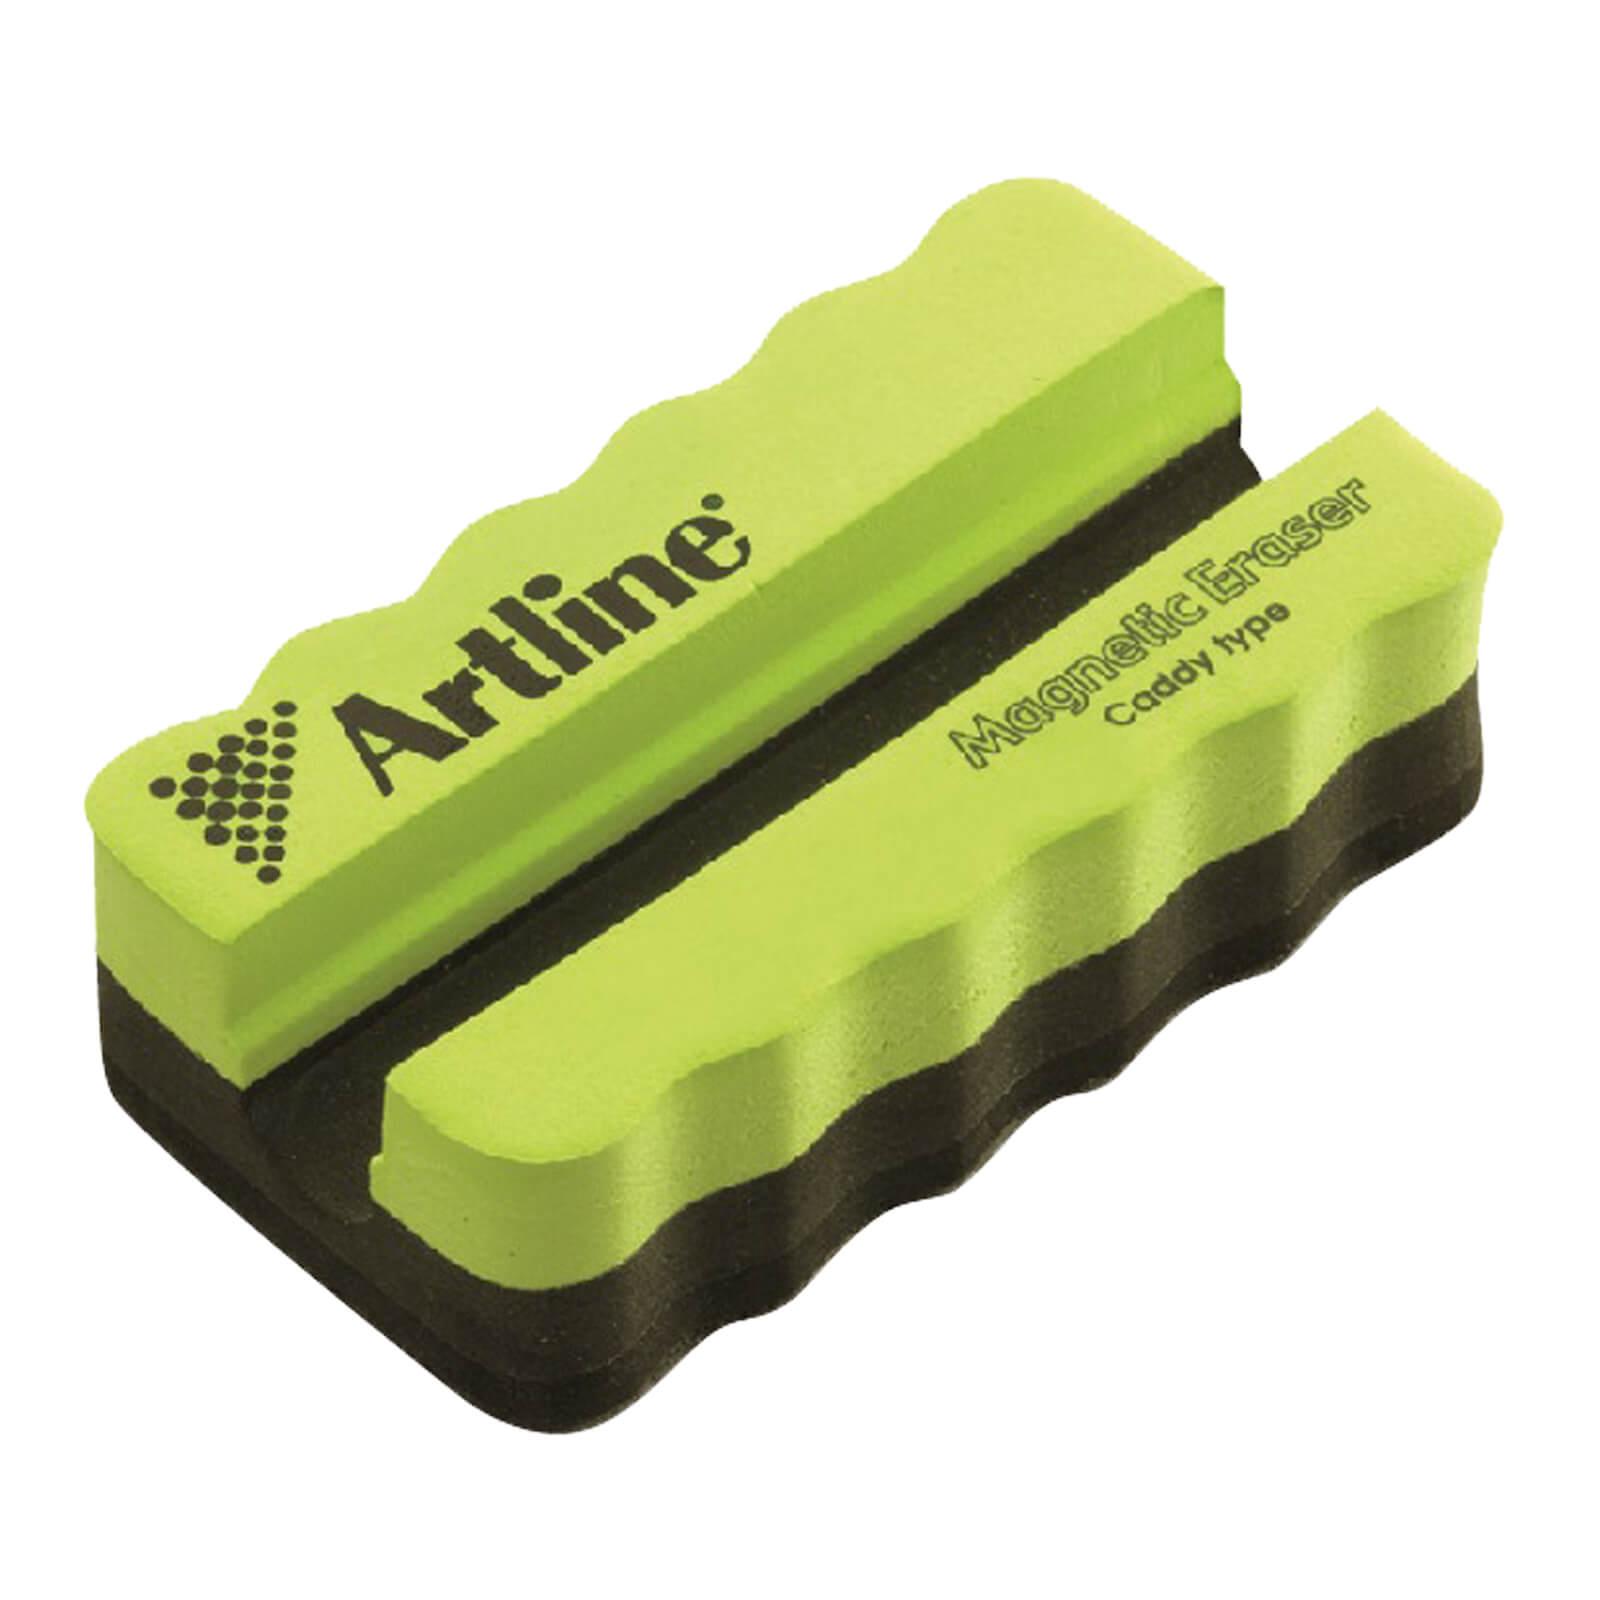 Artline Magnetic Whiteboard Eraser with Holder - Green (pc)